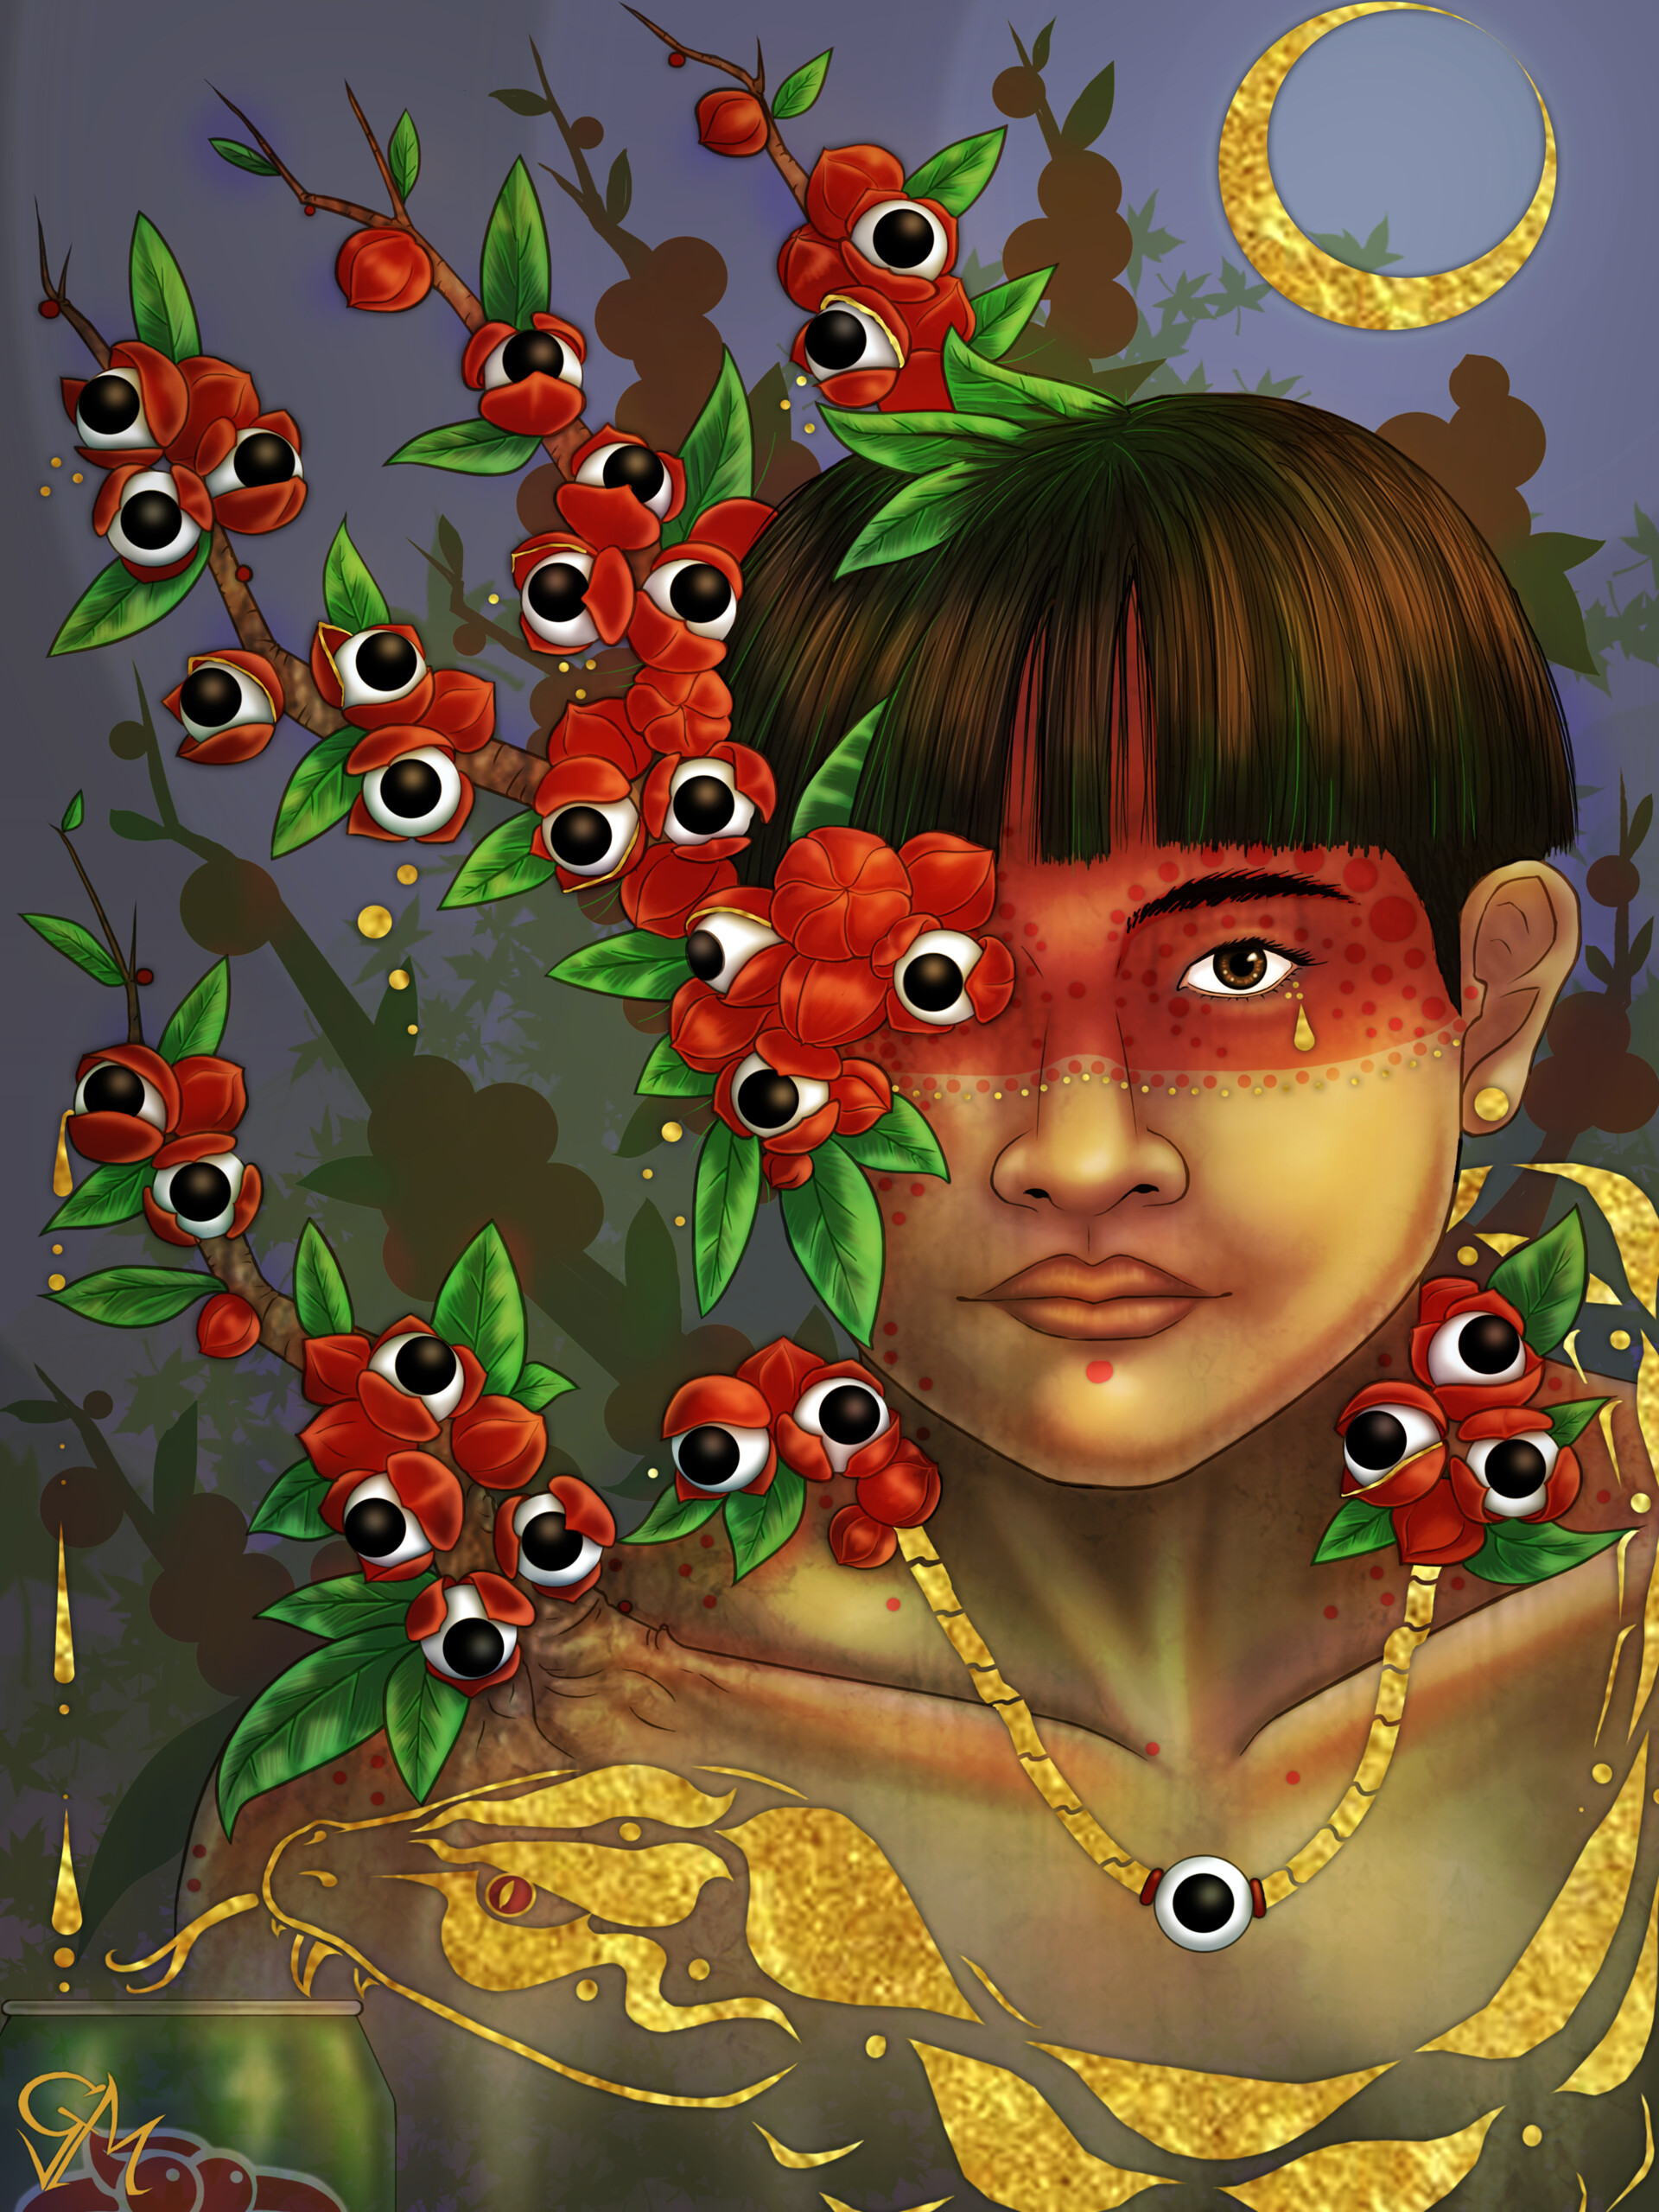 Artstation Imaginary Creatures Folklore Gustavo Matsunaga